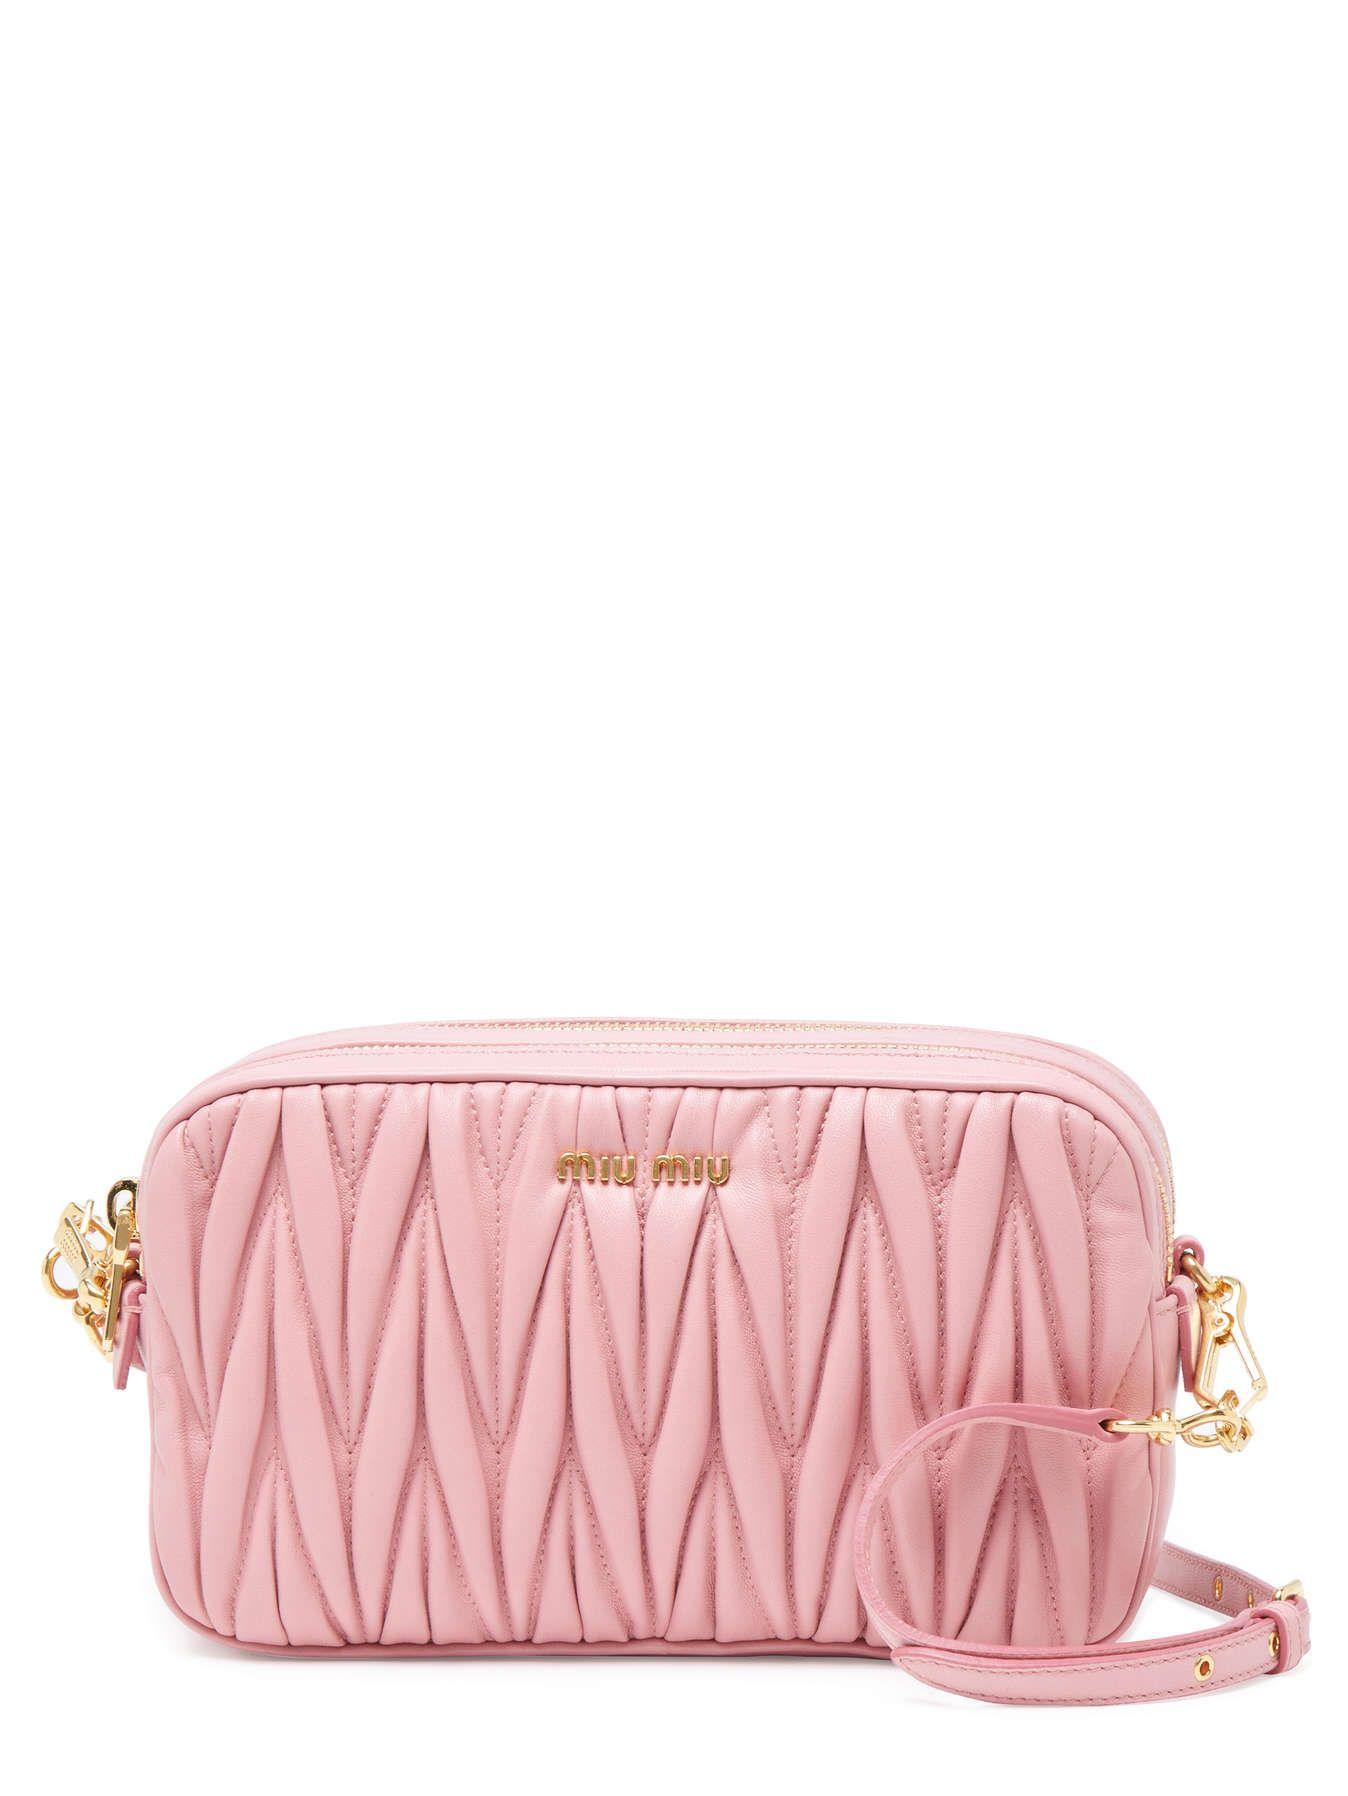 844813b79e0 Small Matelassé Leather Double Zip Crossbody   Handbags   Clutches ...